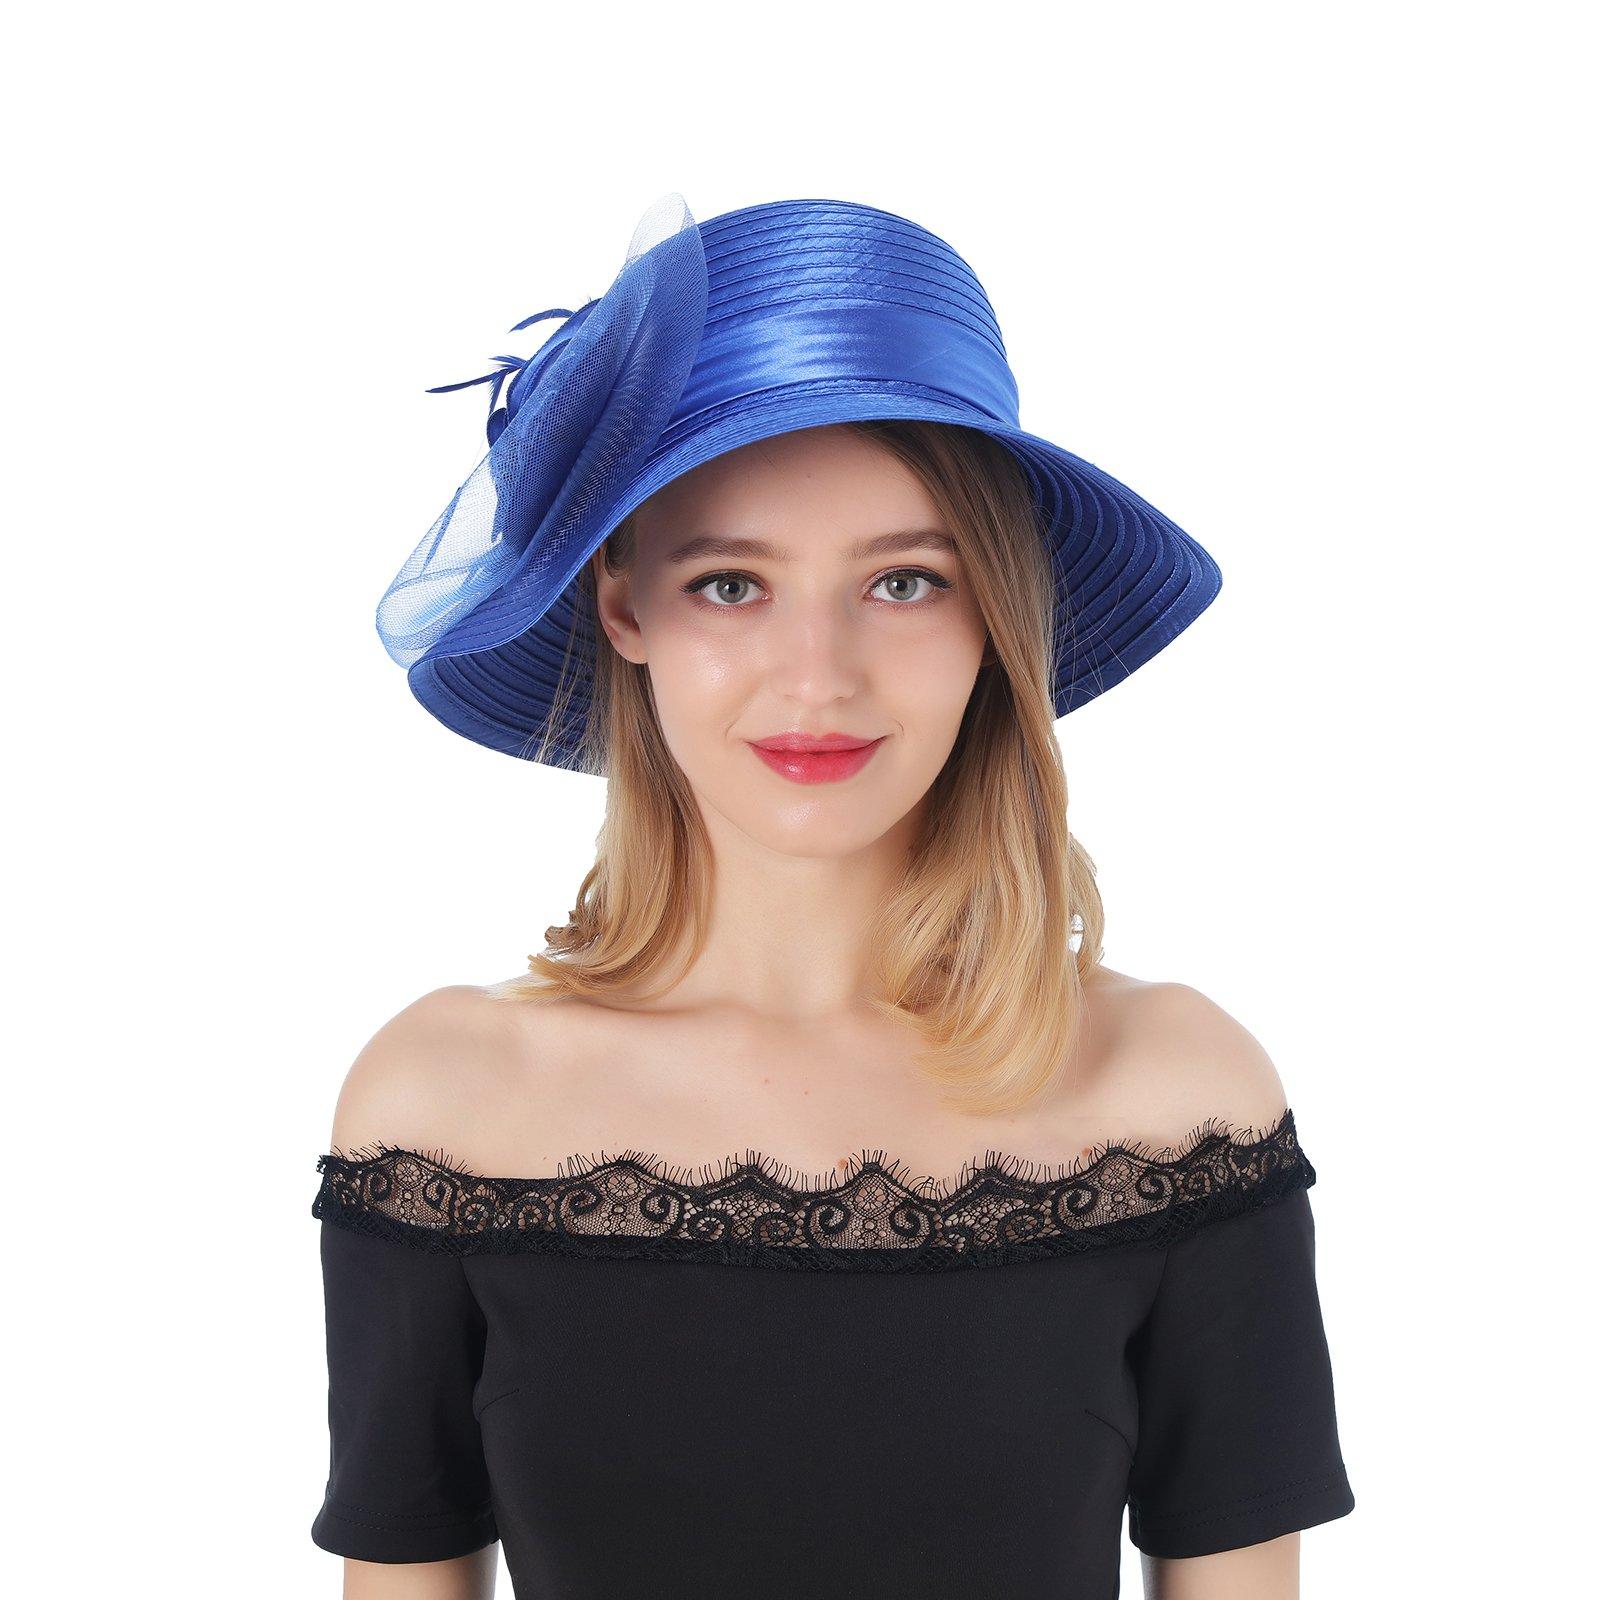 Dantiya Women's Organza Wide Brim Floral Ribbon Kentucky Derby Church Dress Sun Hat (Free, 2 Style-Blue)